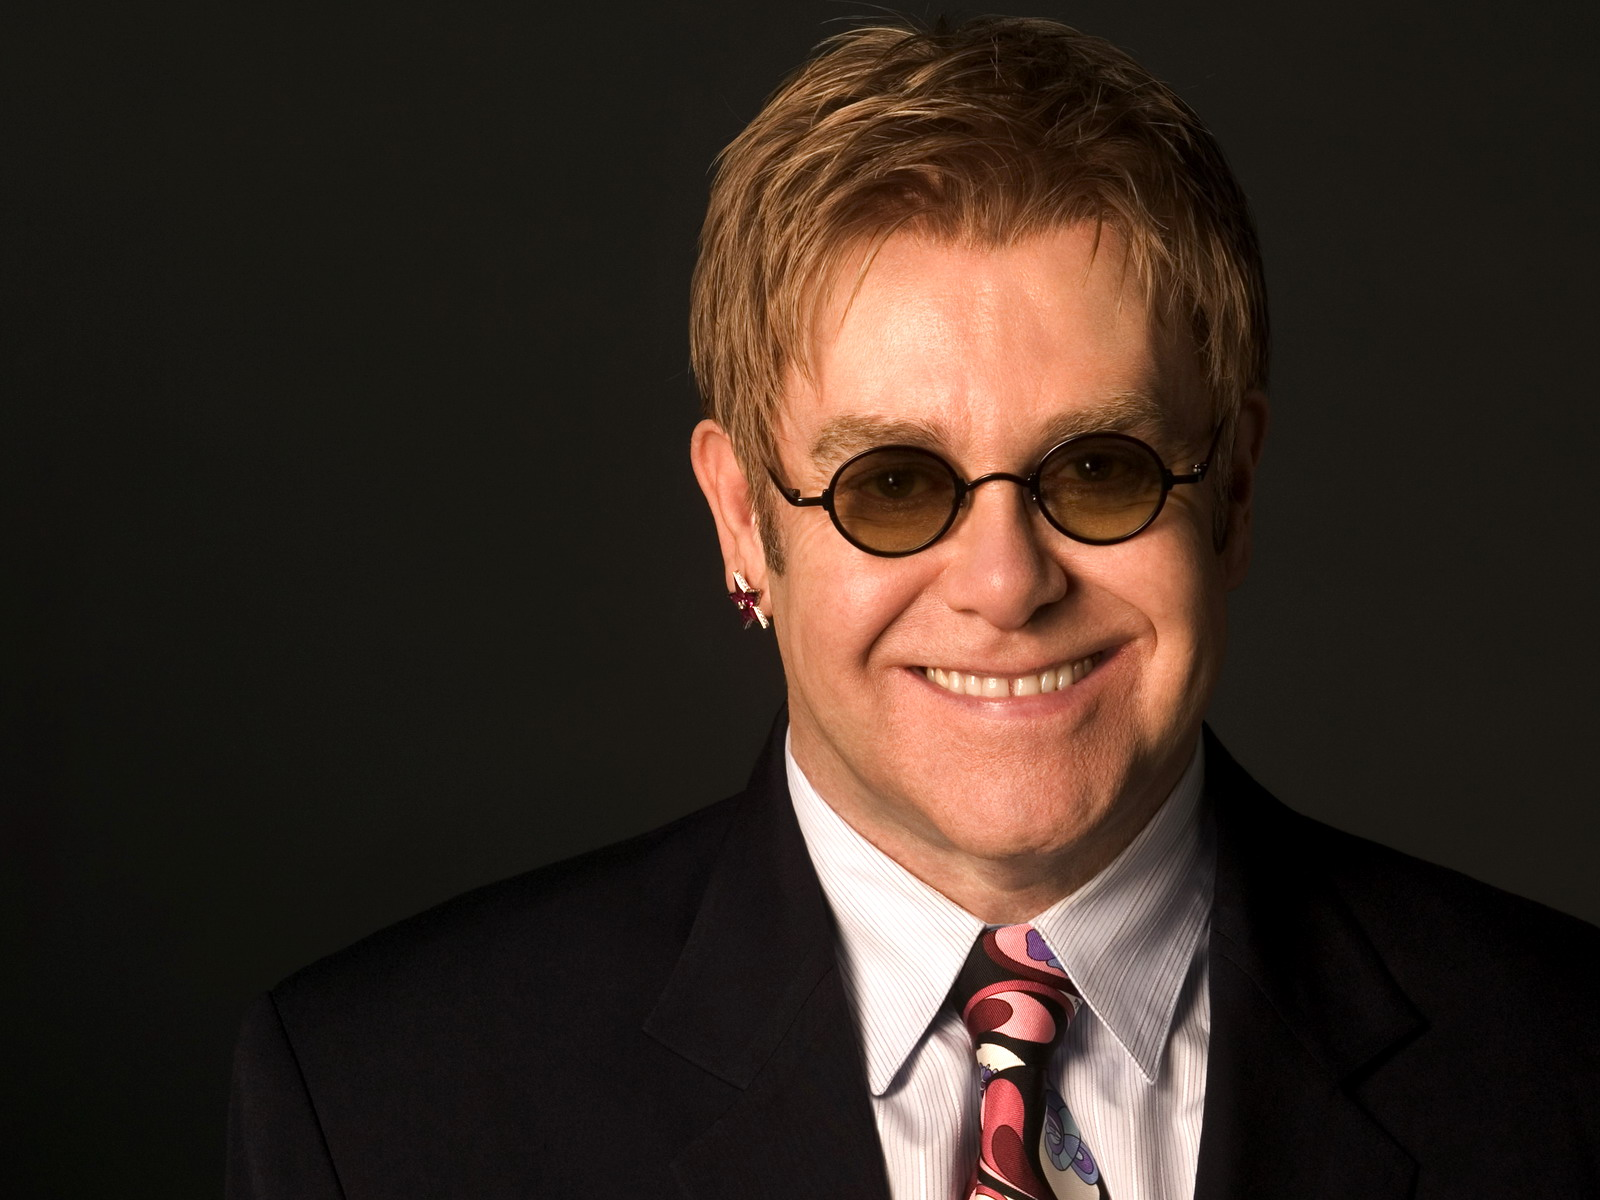 Elton John Smile Computer Wallpaper 60606 1600x1200px 1600x1200